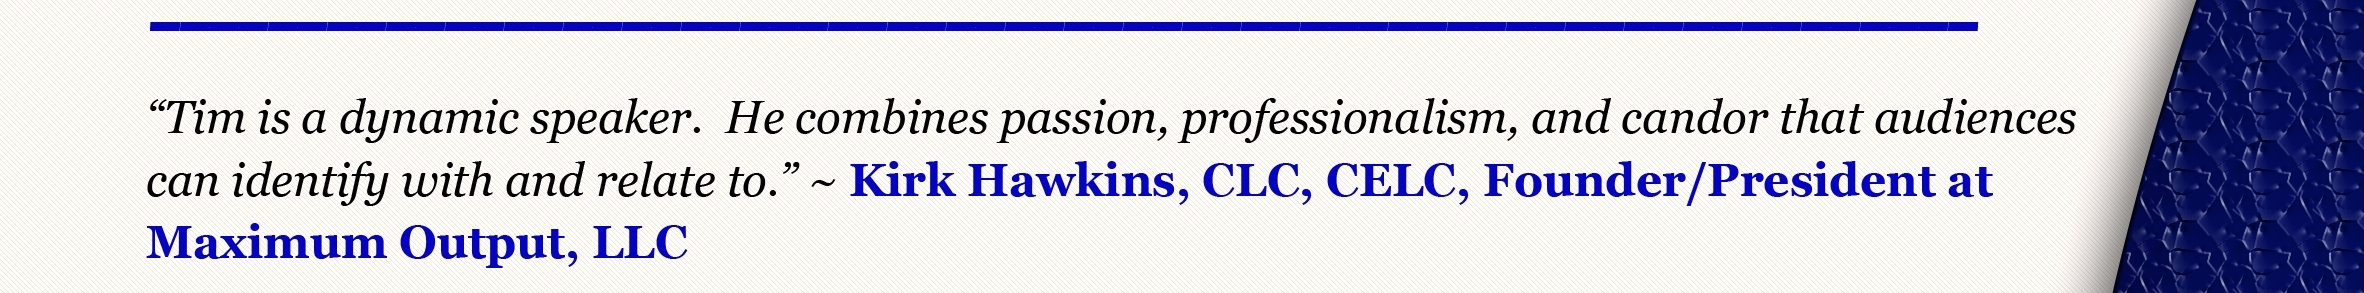 Kirk Hawkins' Quote